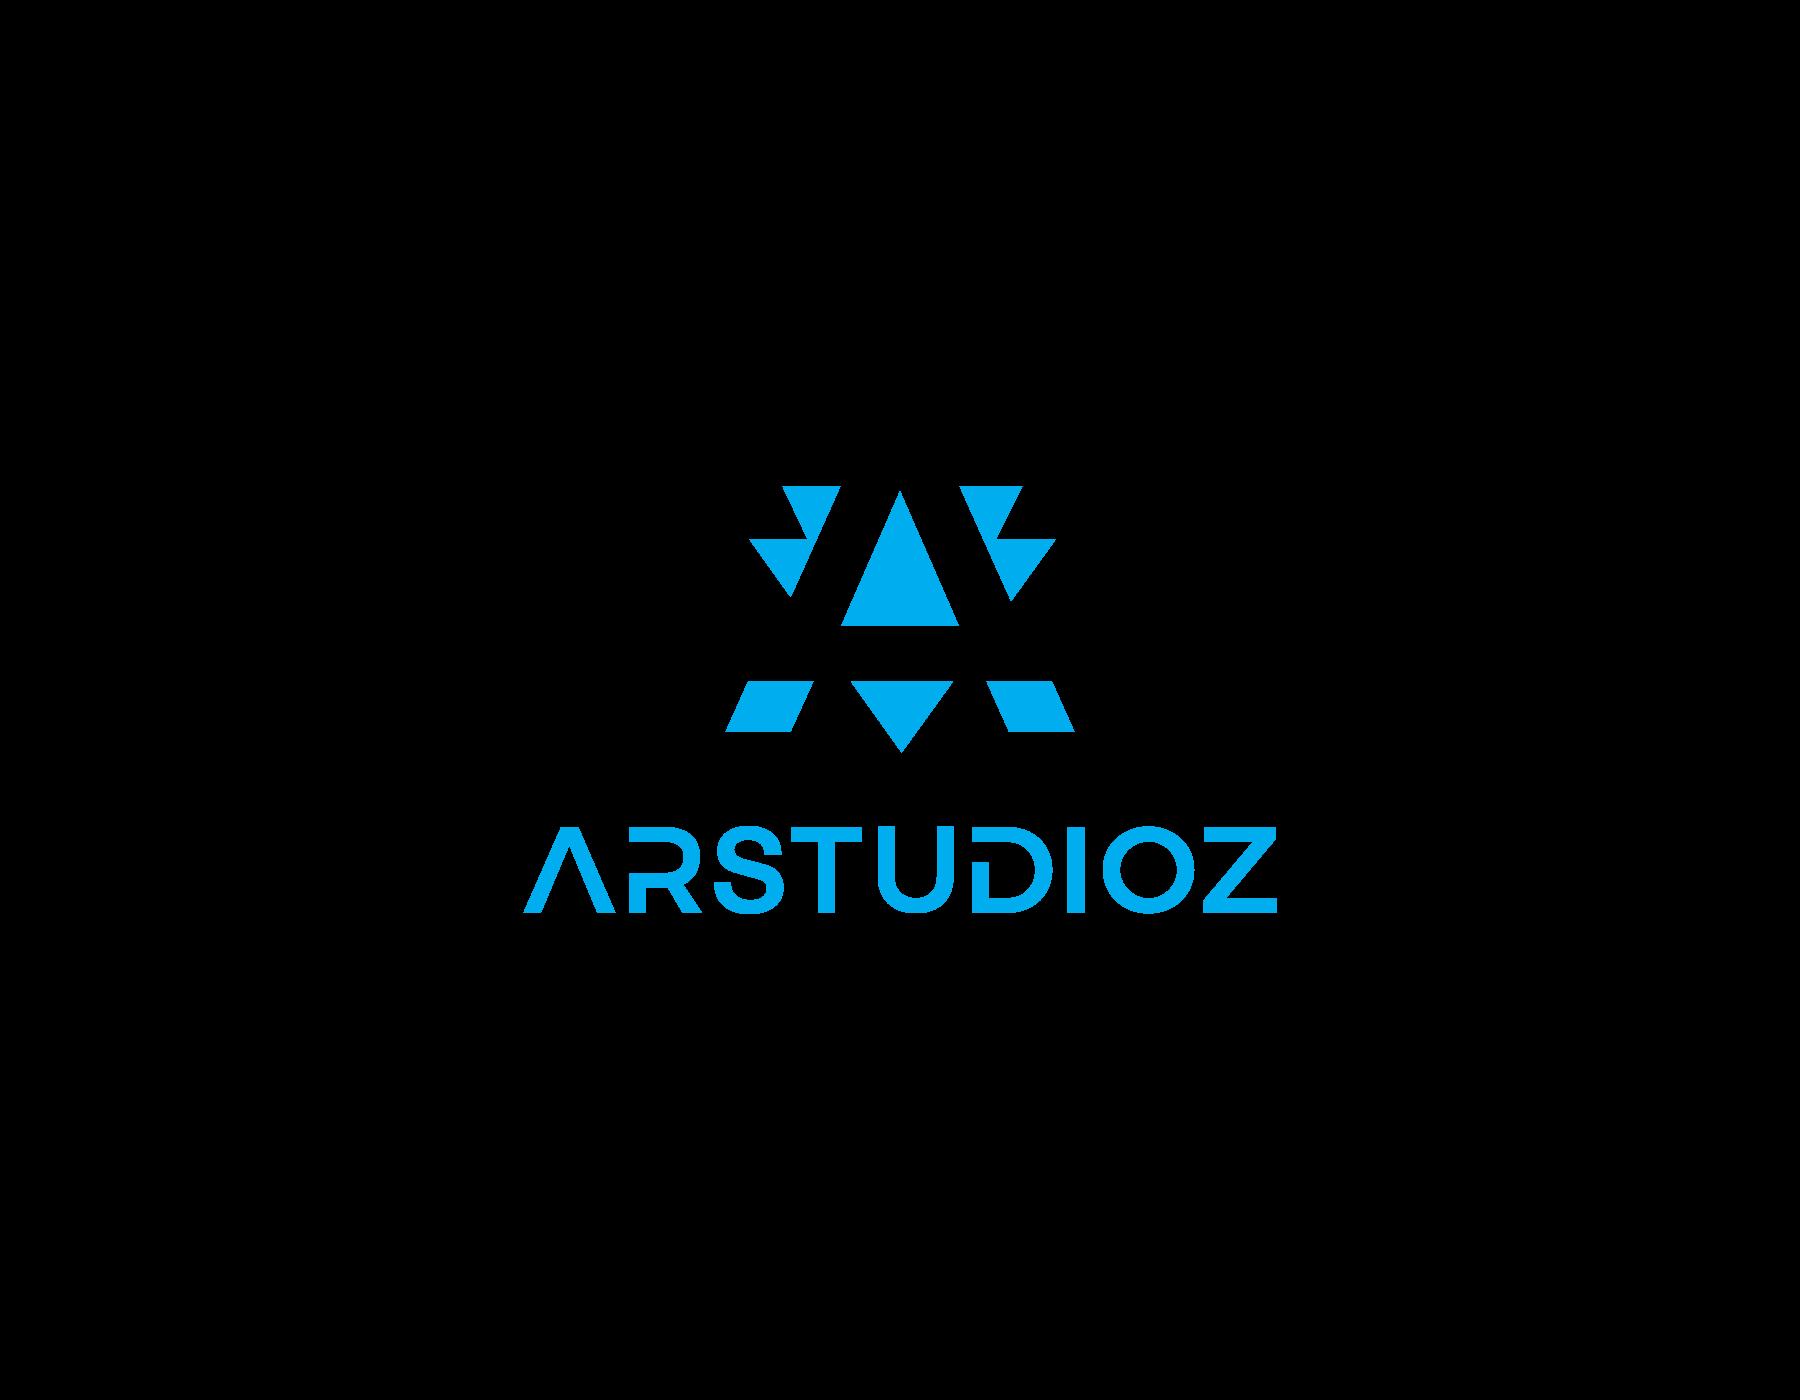 Arstudioz (arstudioz02)